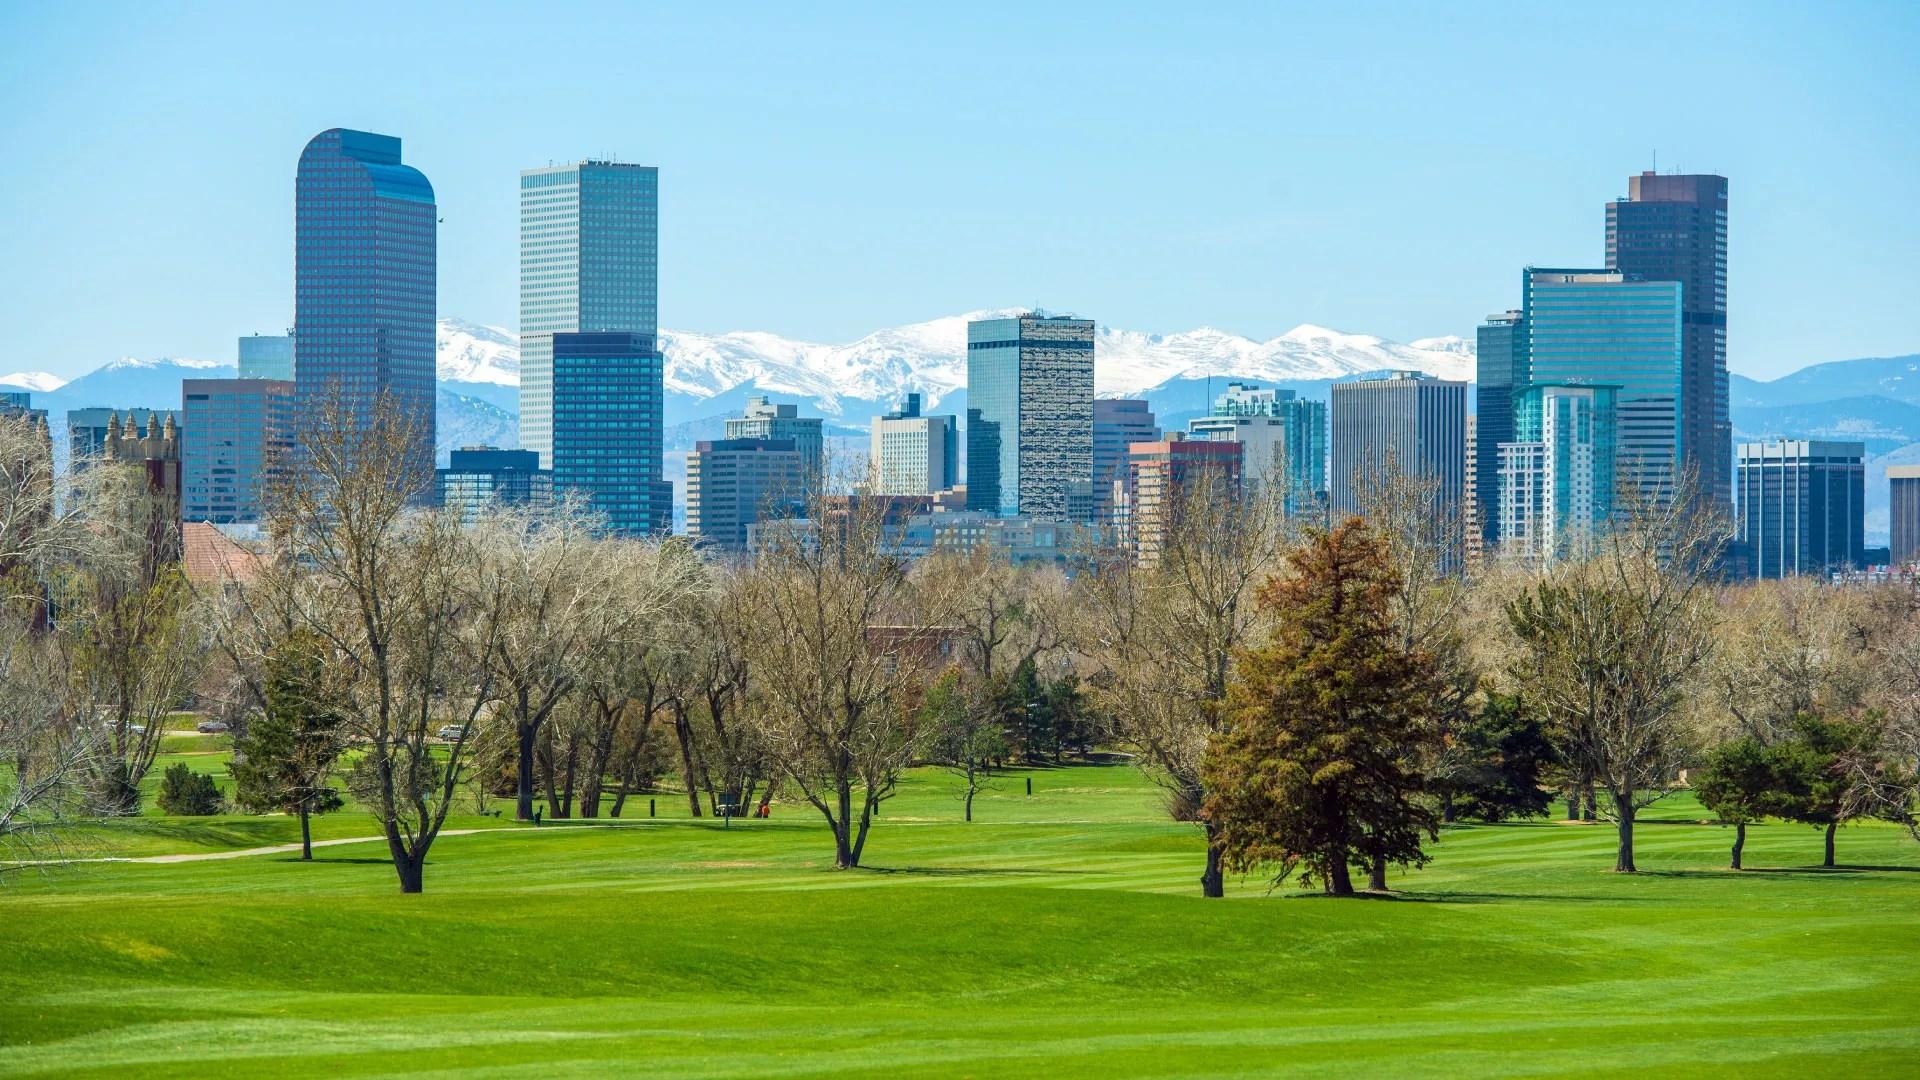 Best Neighborhoods in Denver for Young Professionals via @extraspace